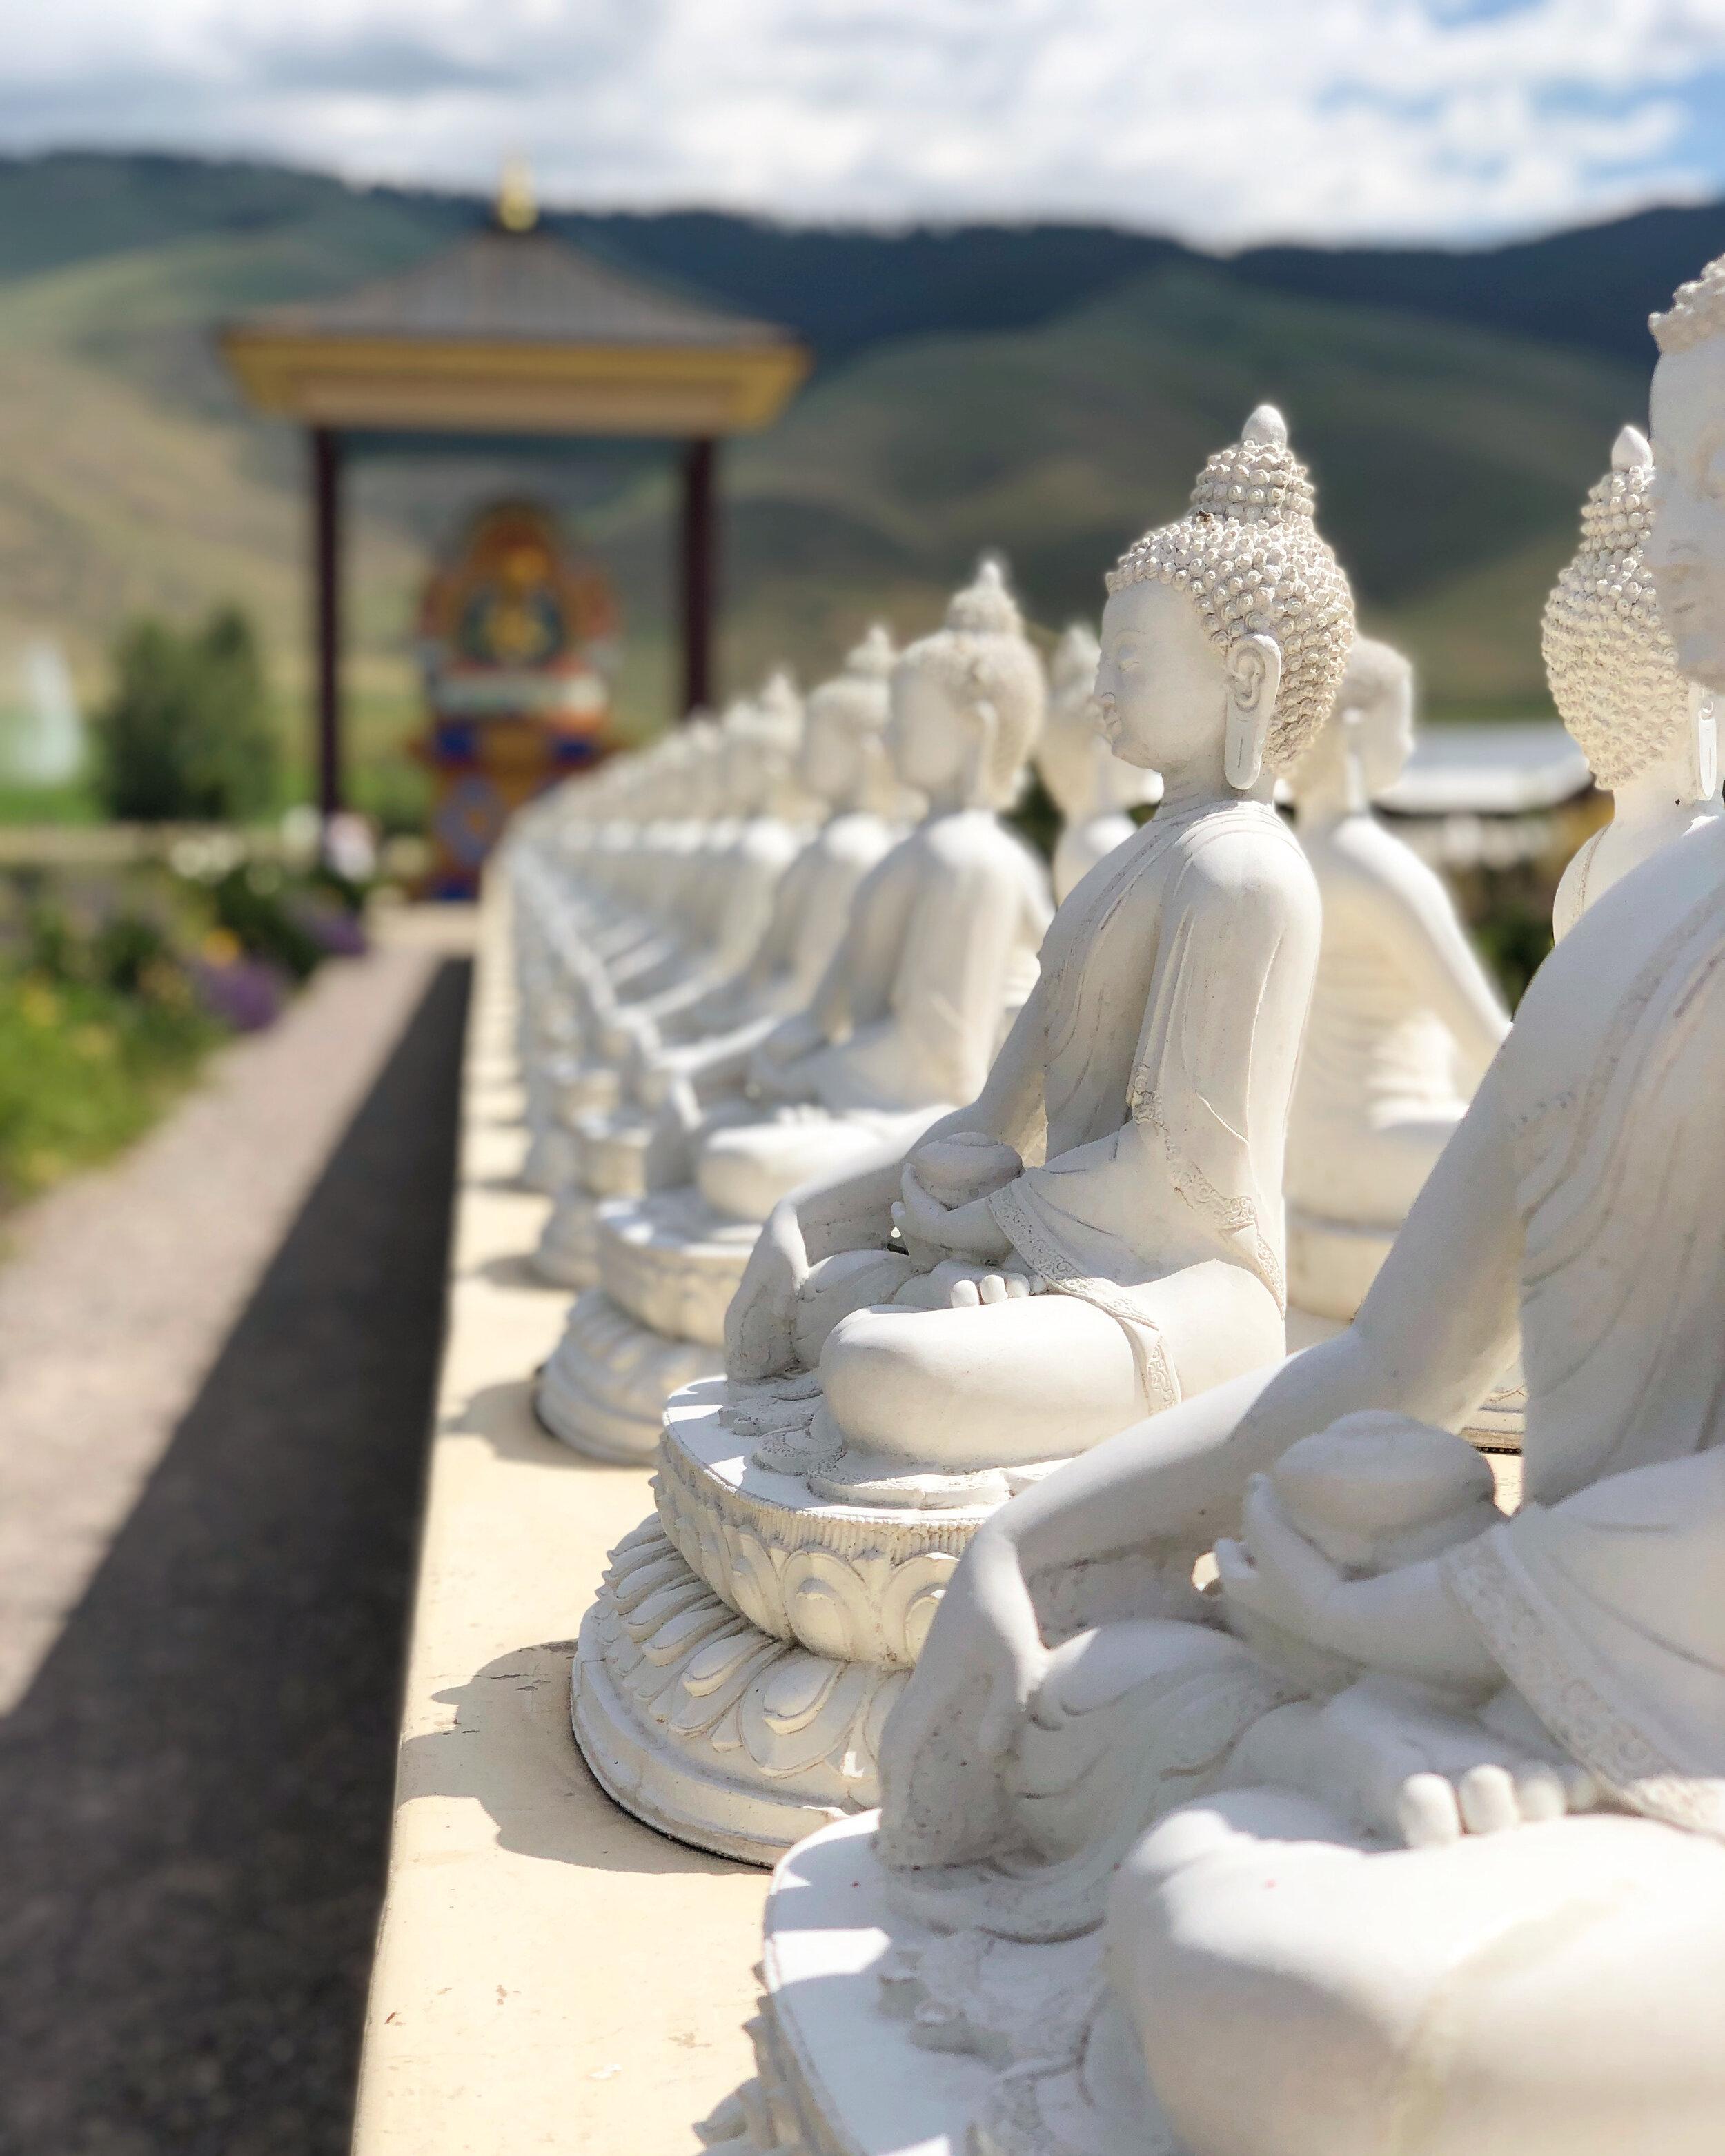 The Garden Of One Thousand Buddhas Arctictumbleweed